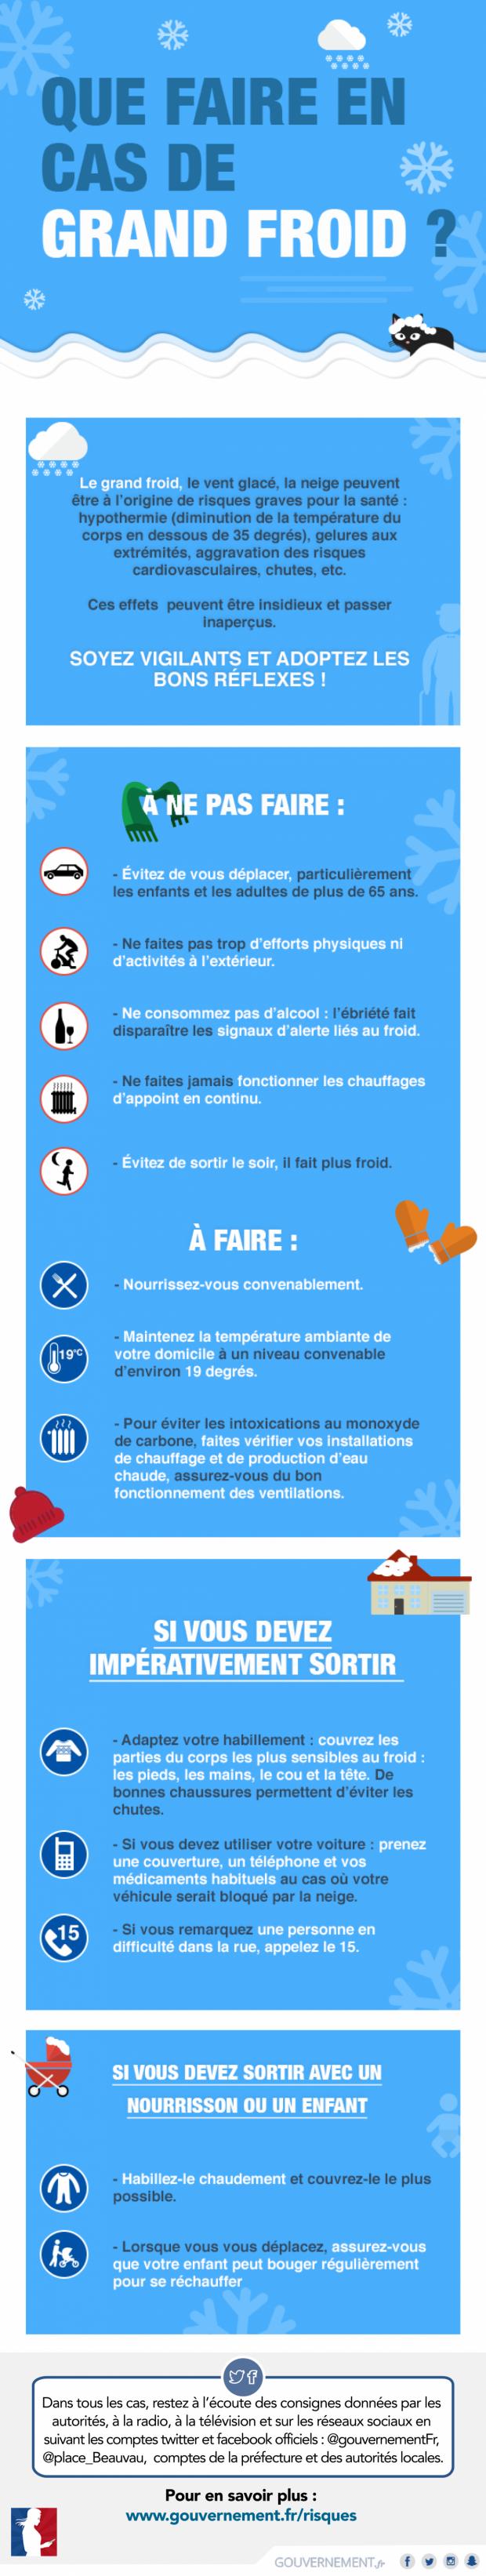 infoggrand_froid_quoi-faire_v2-01